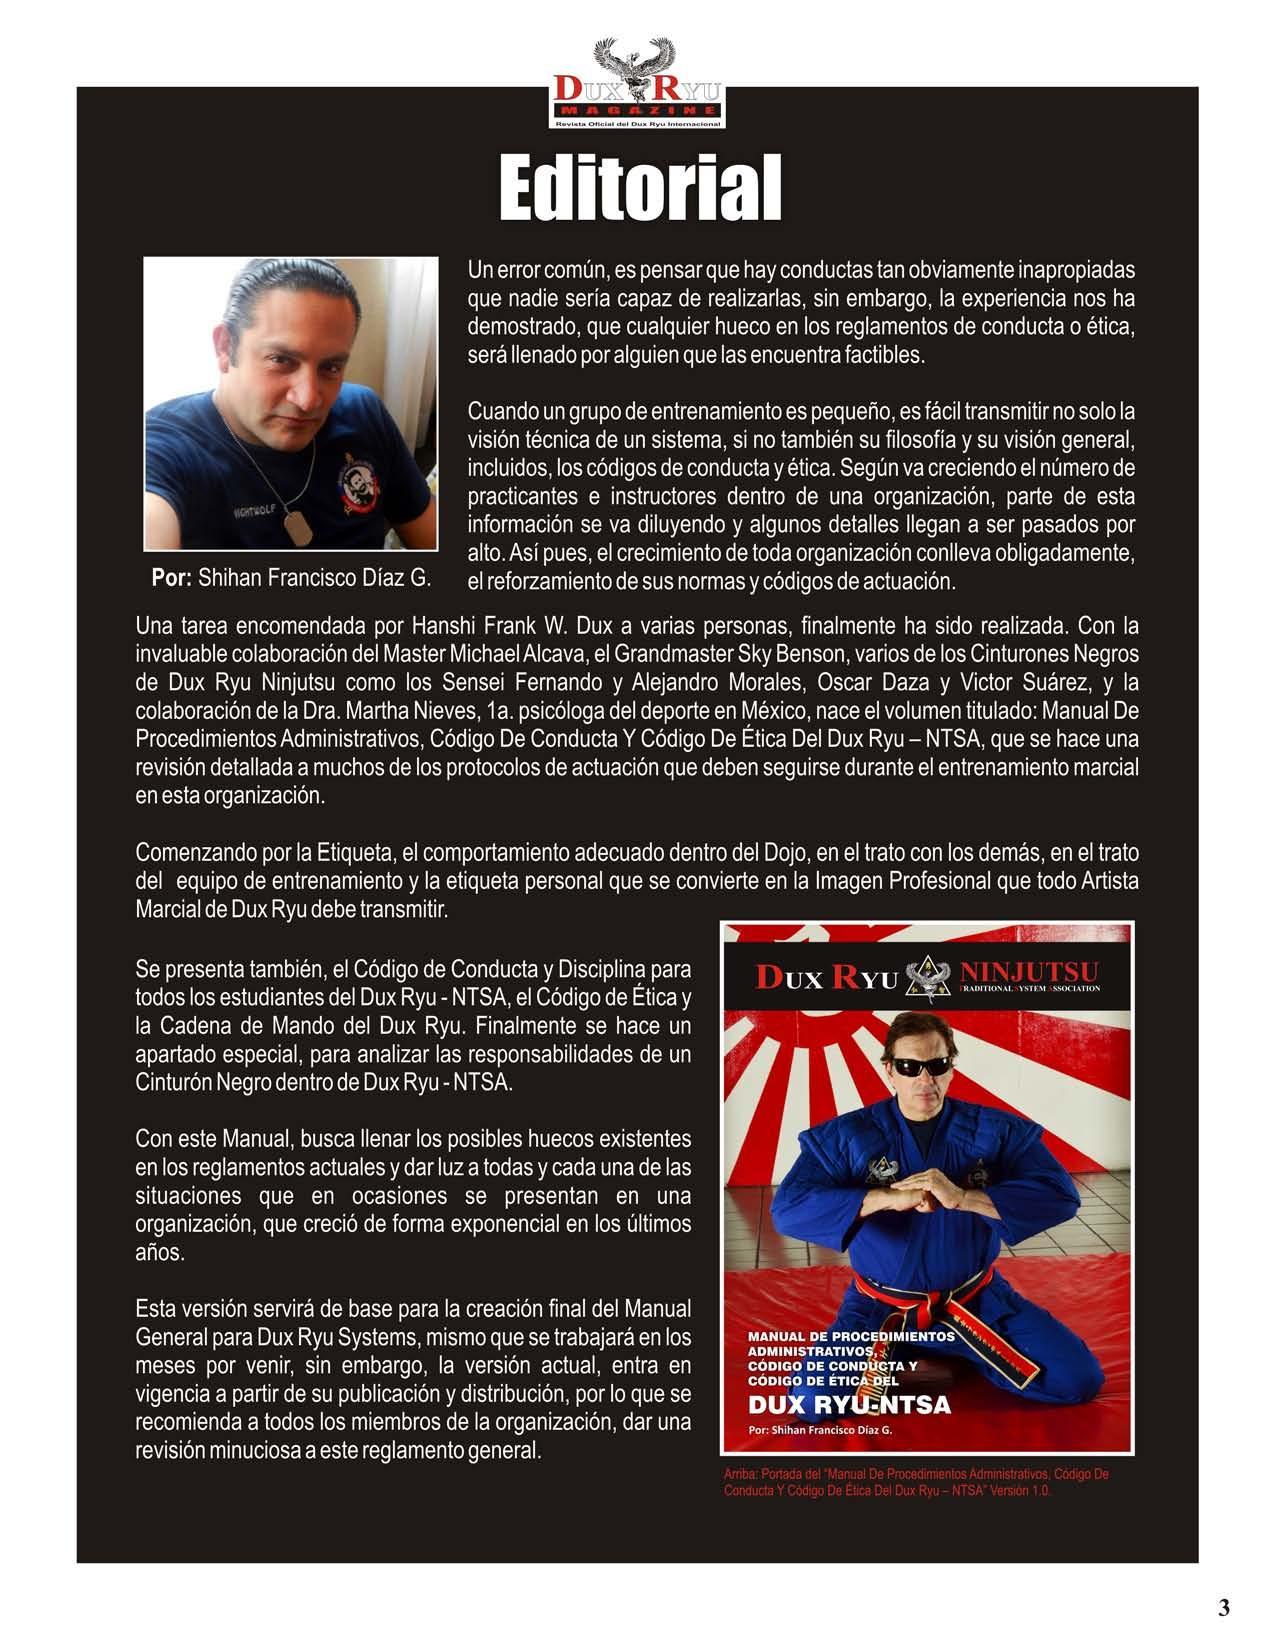 dux-ryu-magazine-07-page-005